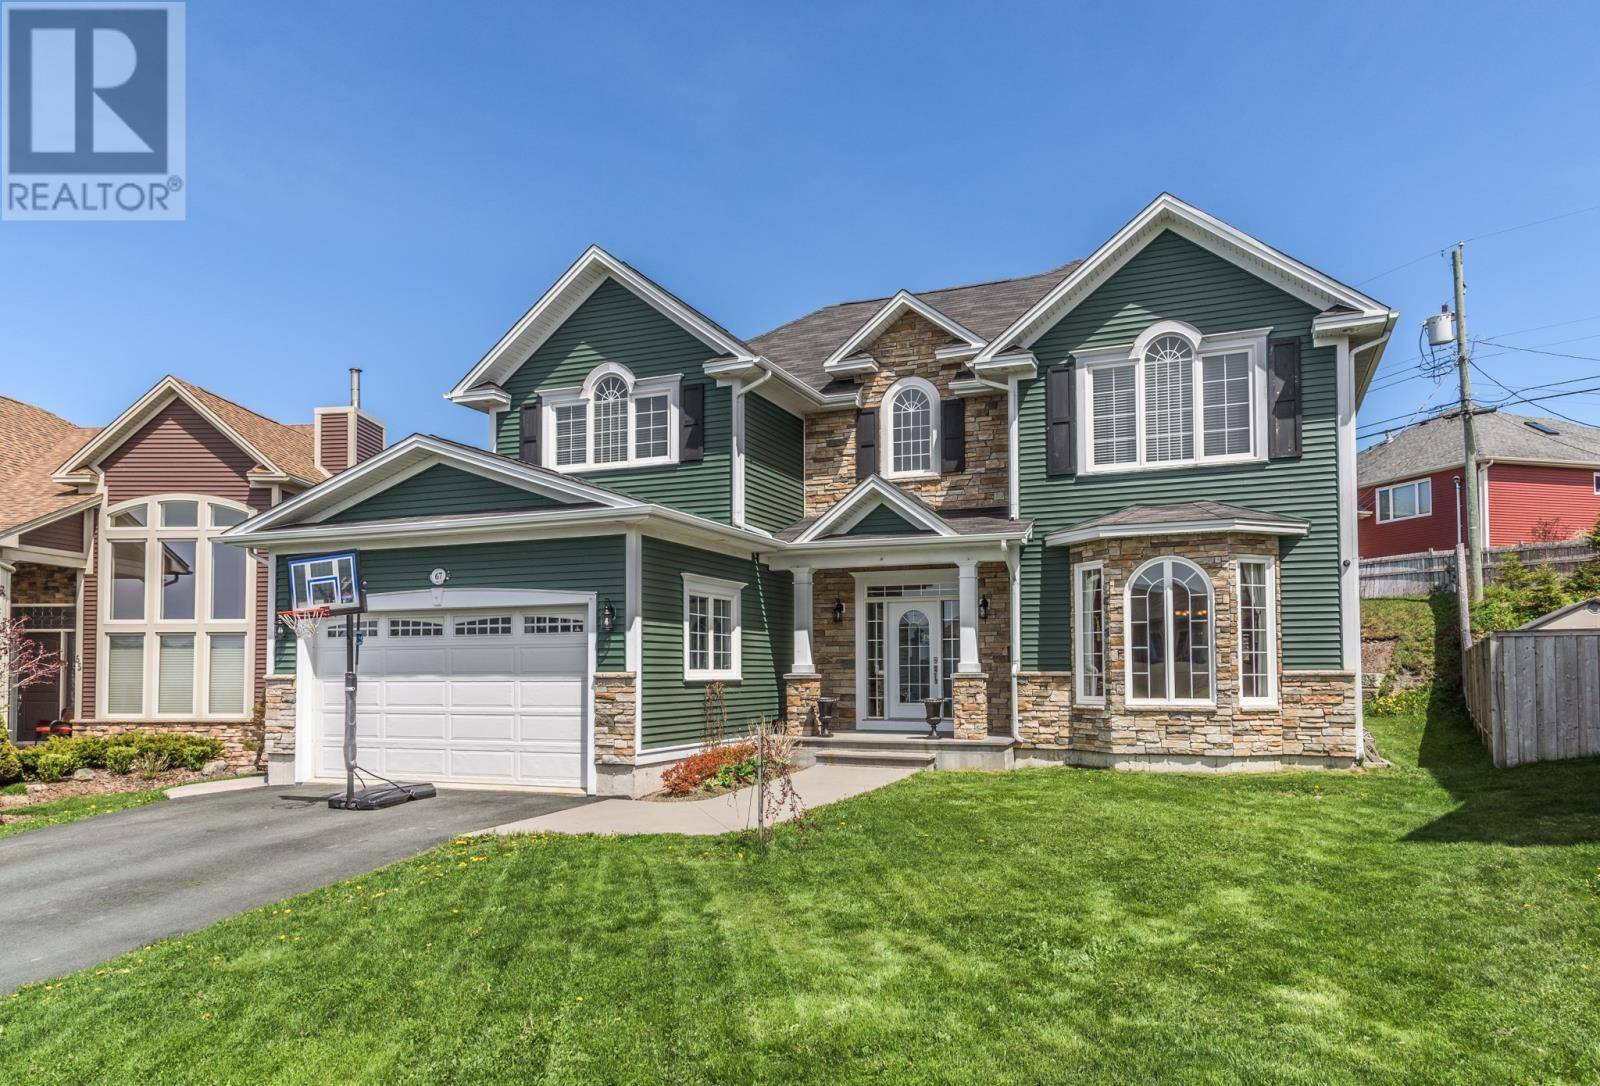 House for sale at 67 Cheyne Dr St. John's Newfoundland - MLS: 1209619